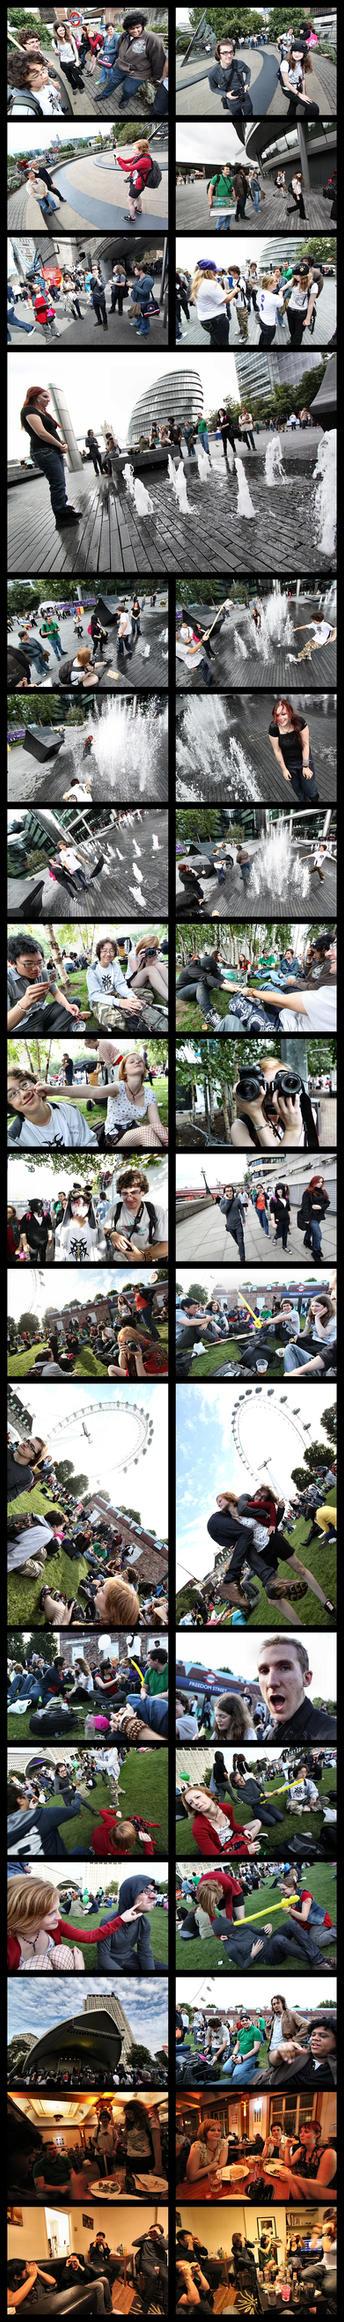 Thames Fest '10 by greenie